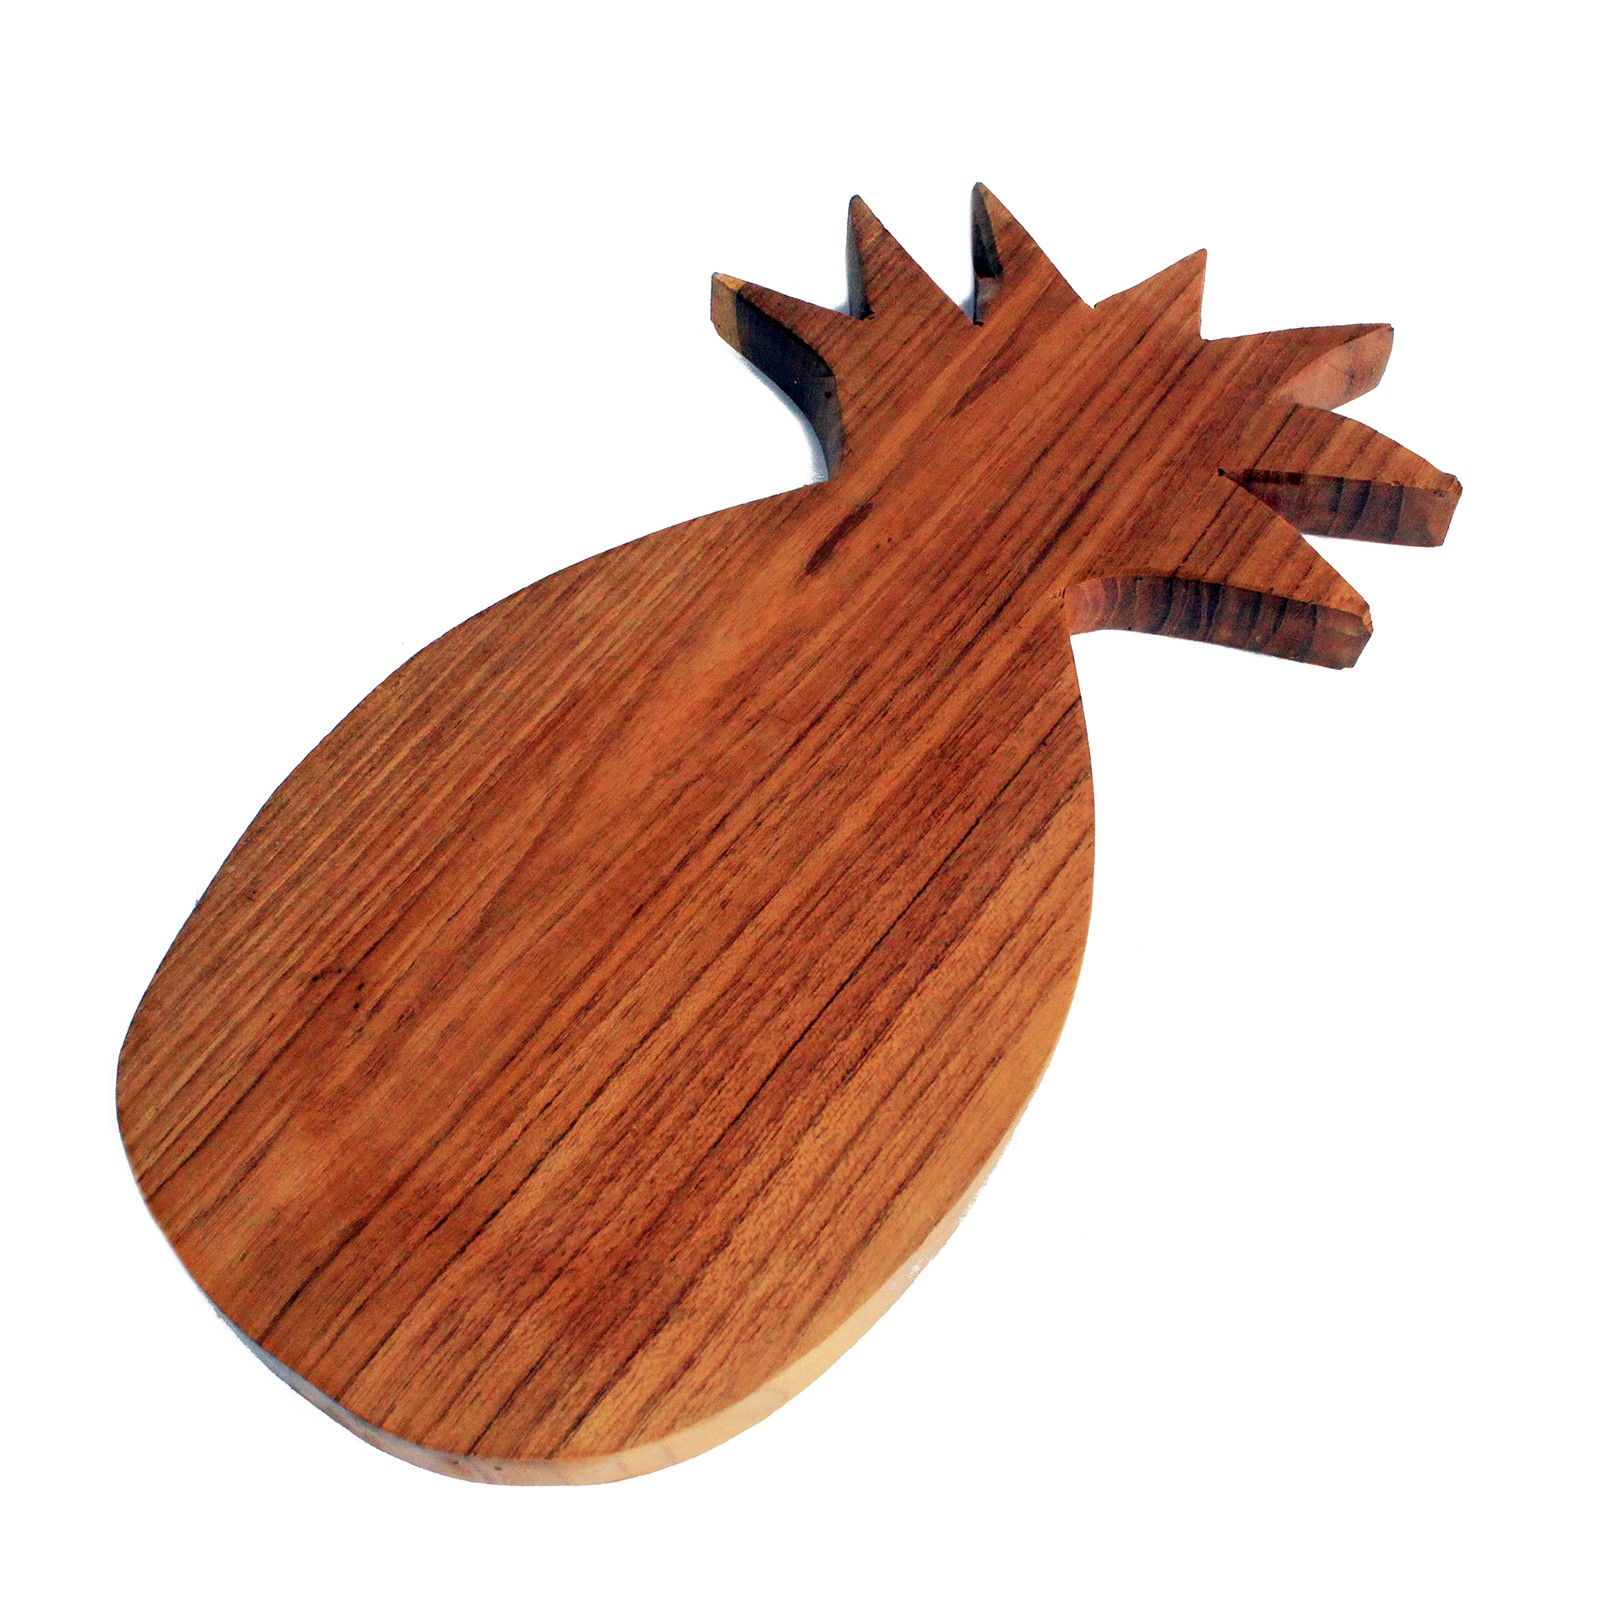 Pineapple Shaped Chopping Board